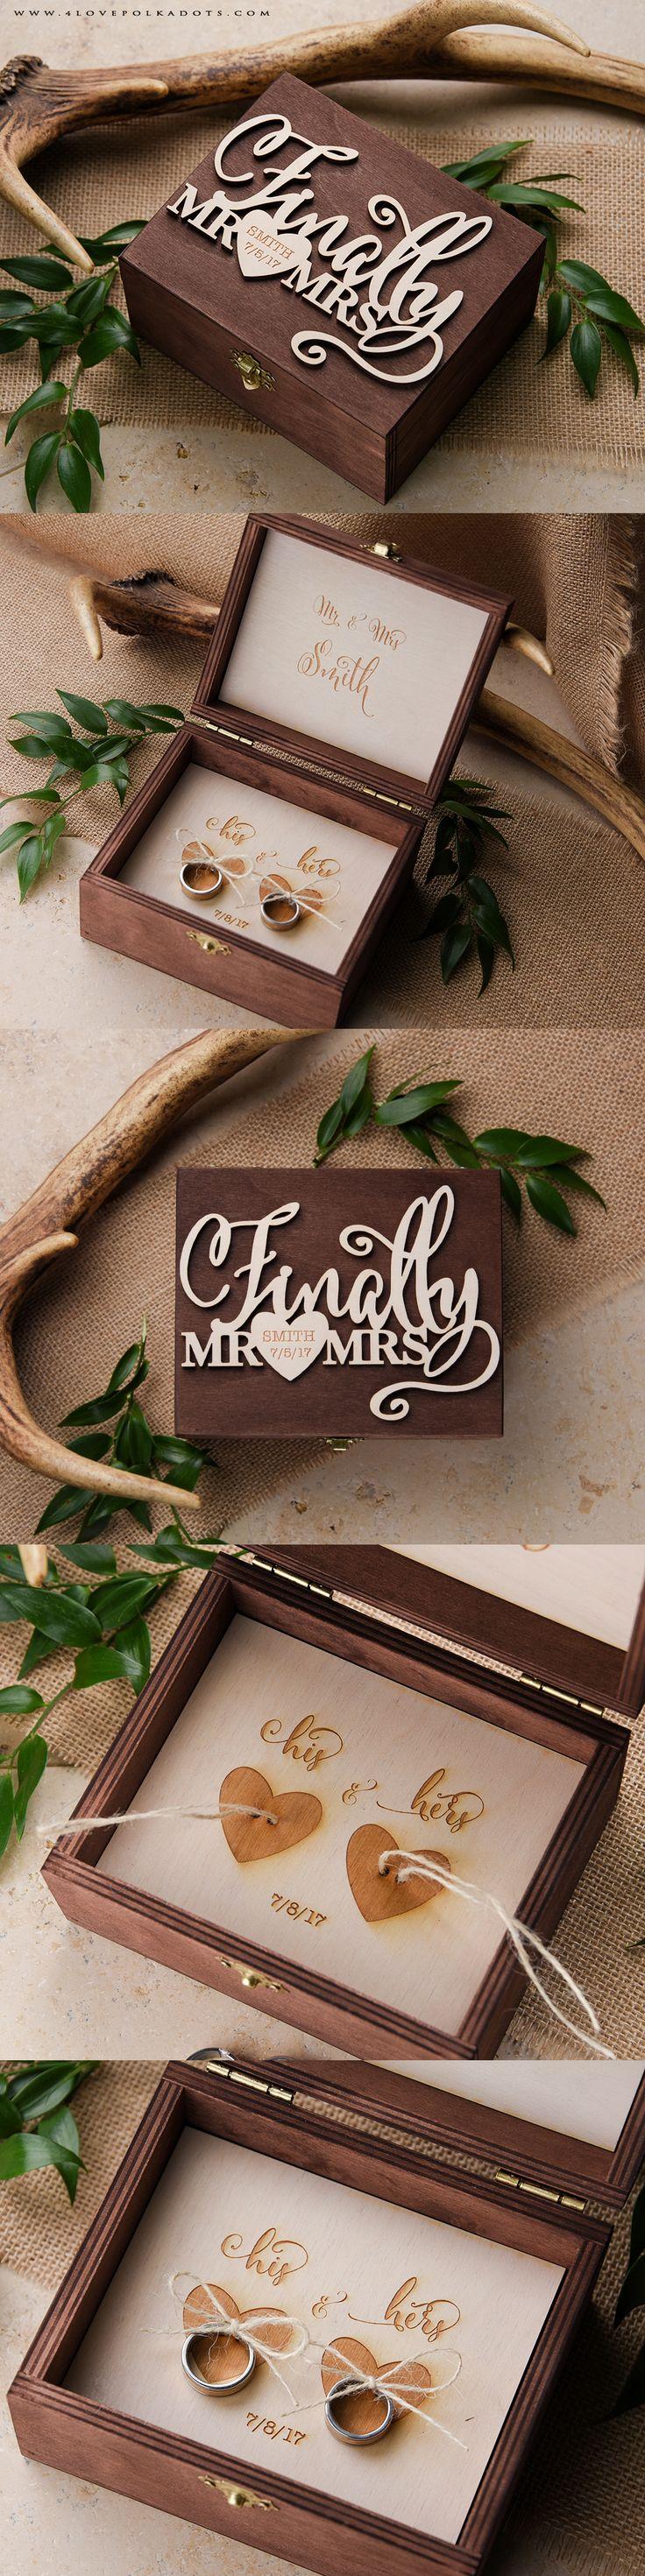 The 25 best ring bearer box ideas on pinterest wedding ring finally mr mrs wedding wooden ring bearer box with custom engraving realwood junglespirit Images